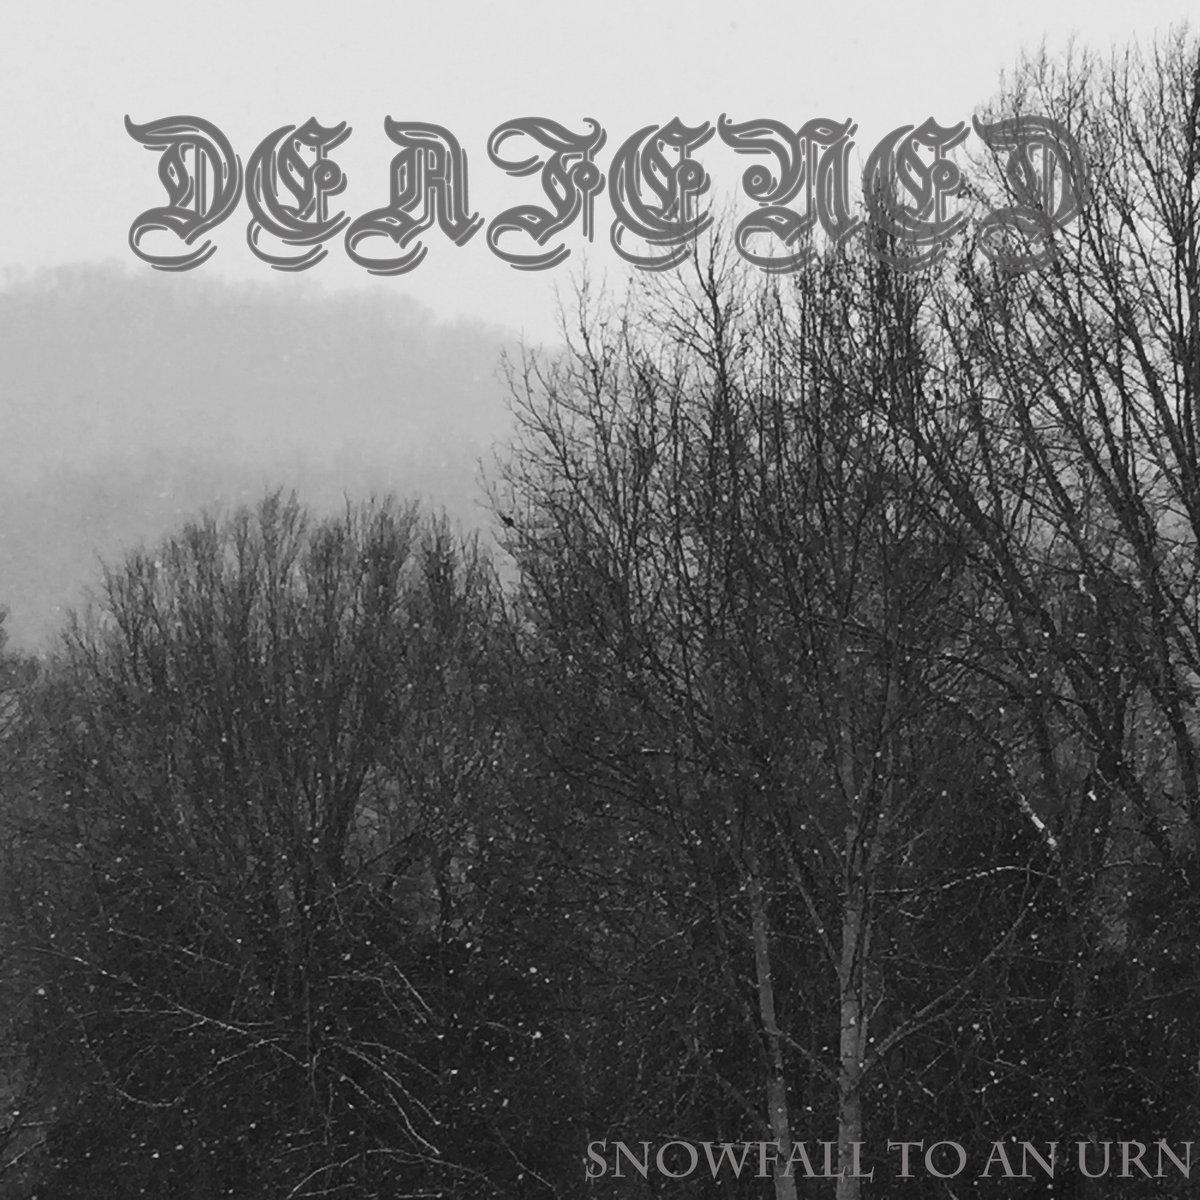 https://deafeneddsbm.bandcamp.com/album/snowfall-to-an-urn